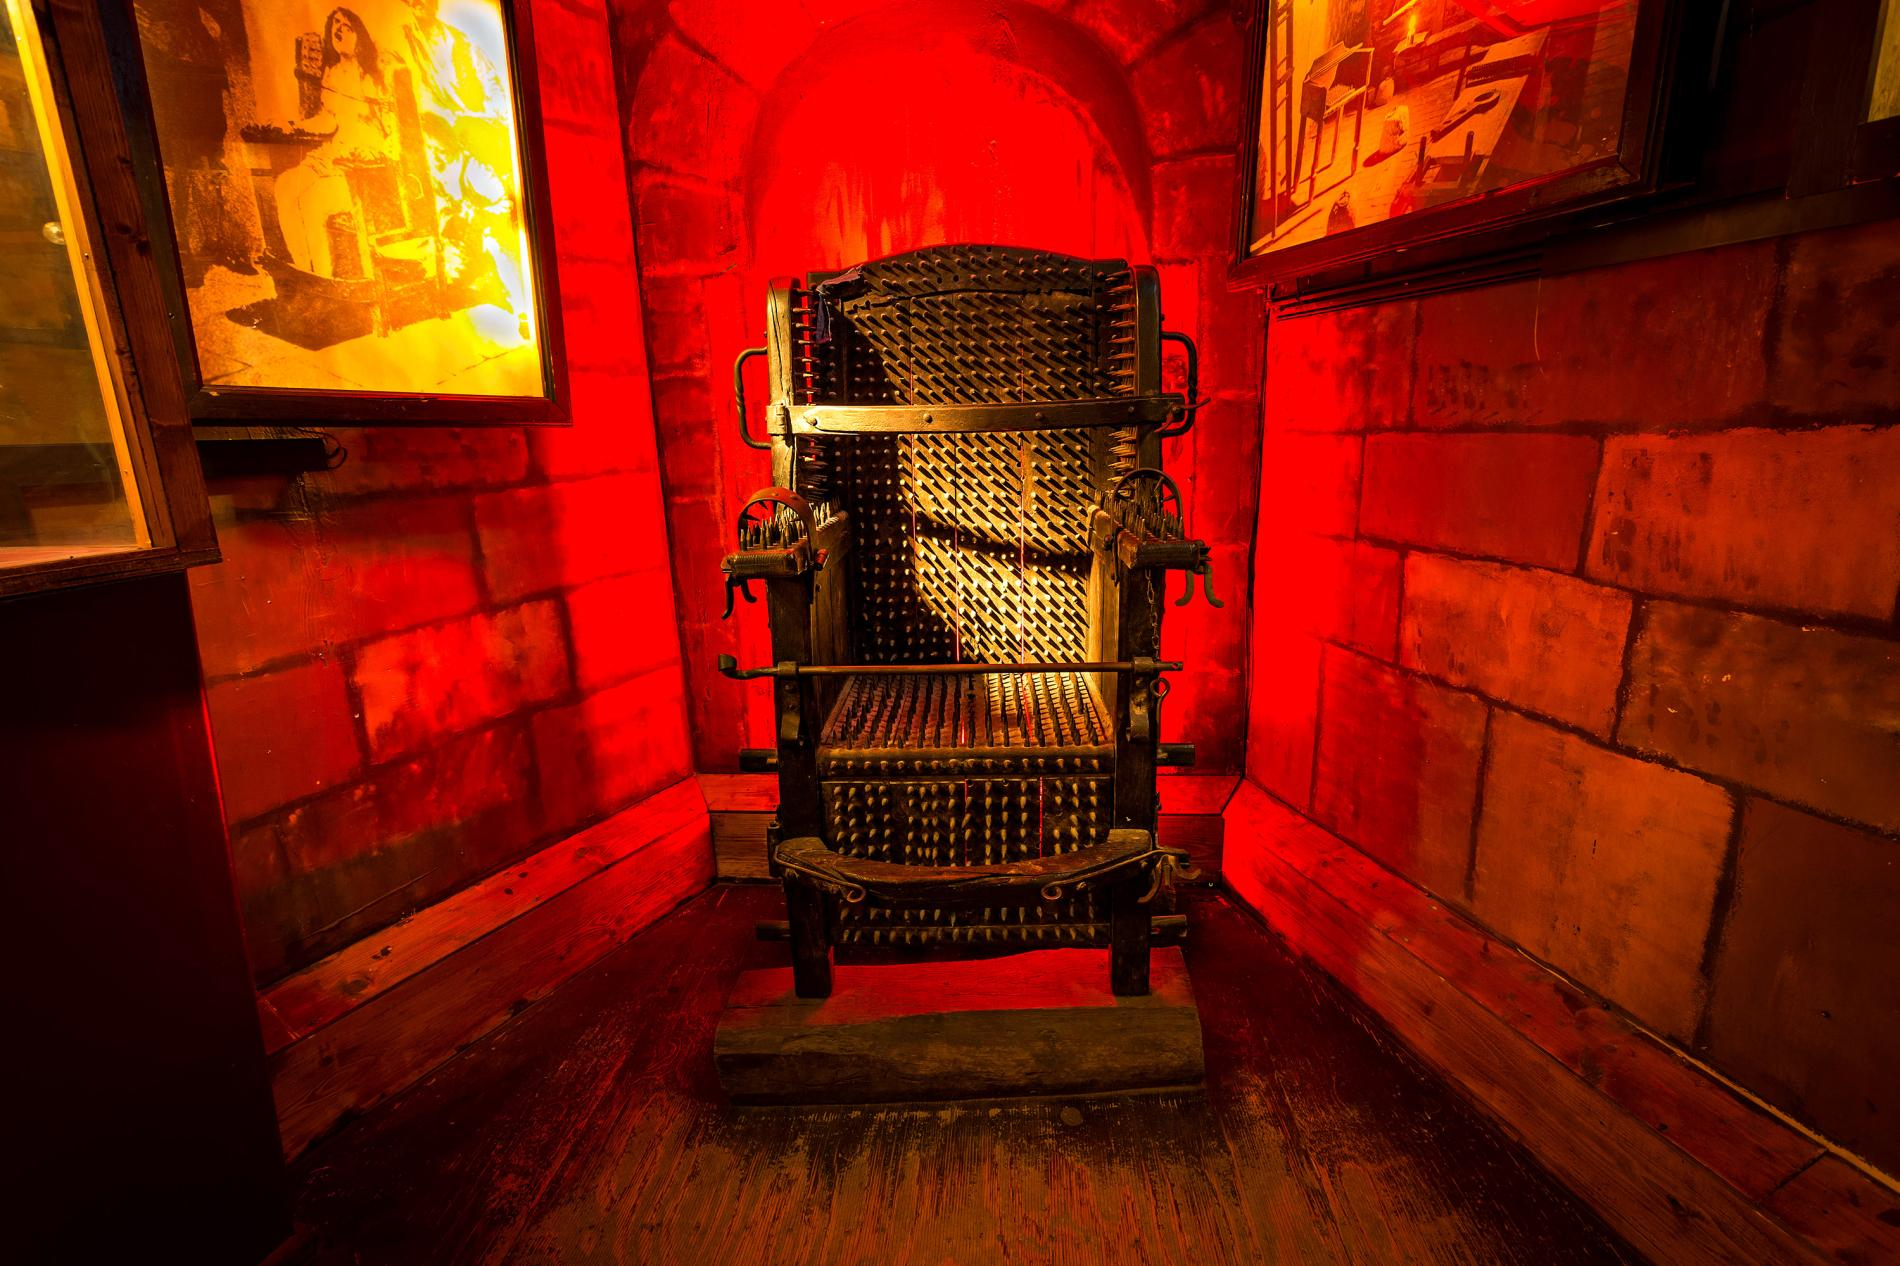 tortue-museum-amsterdam-the-netherlands.ngsversion.1488994206376.adapt.1900.1.jpg